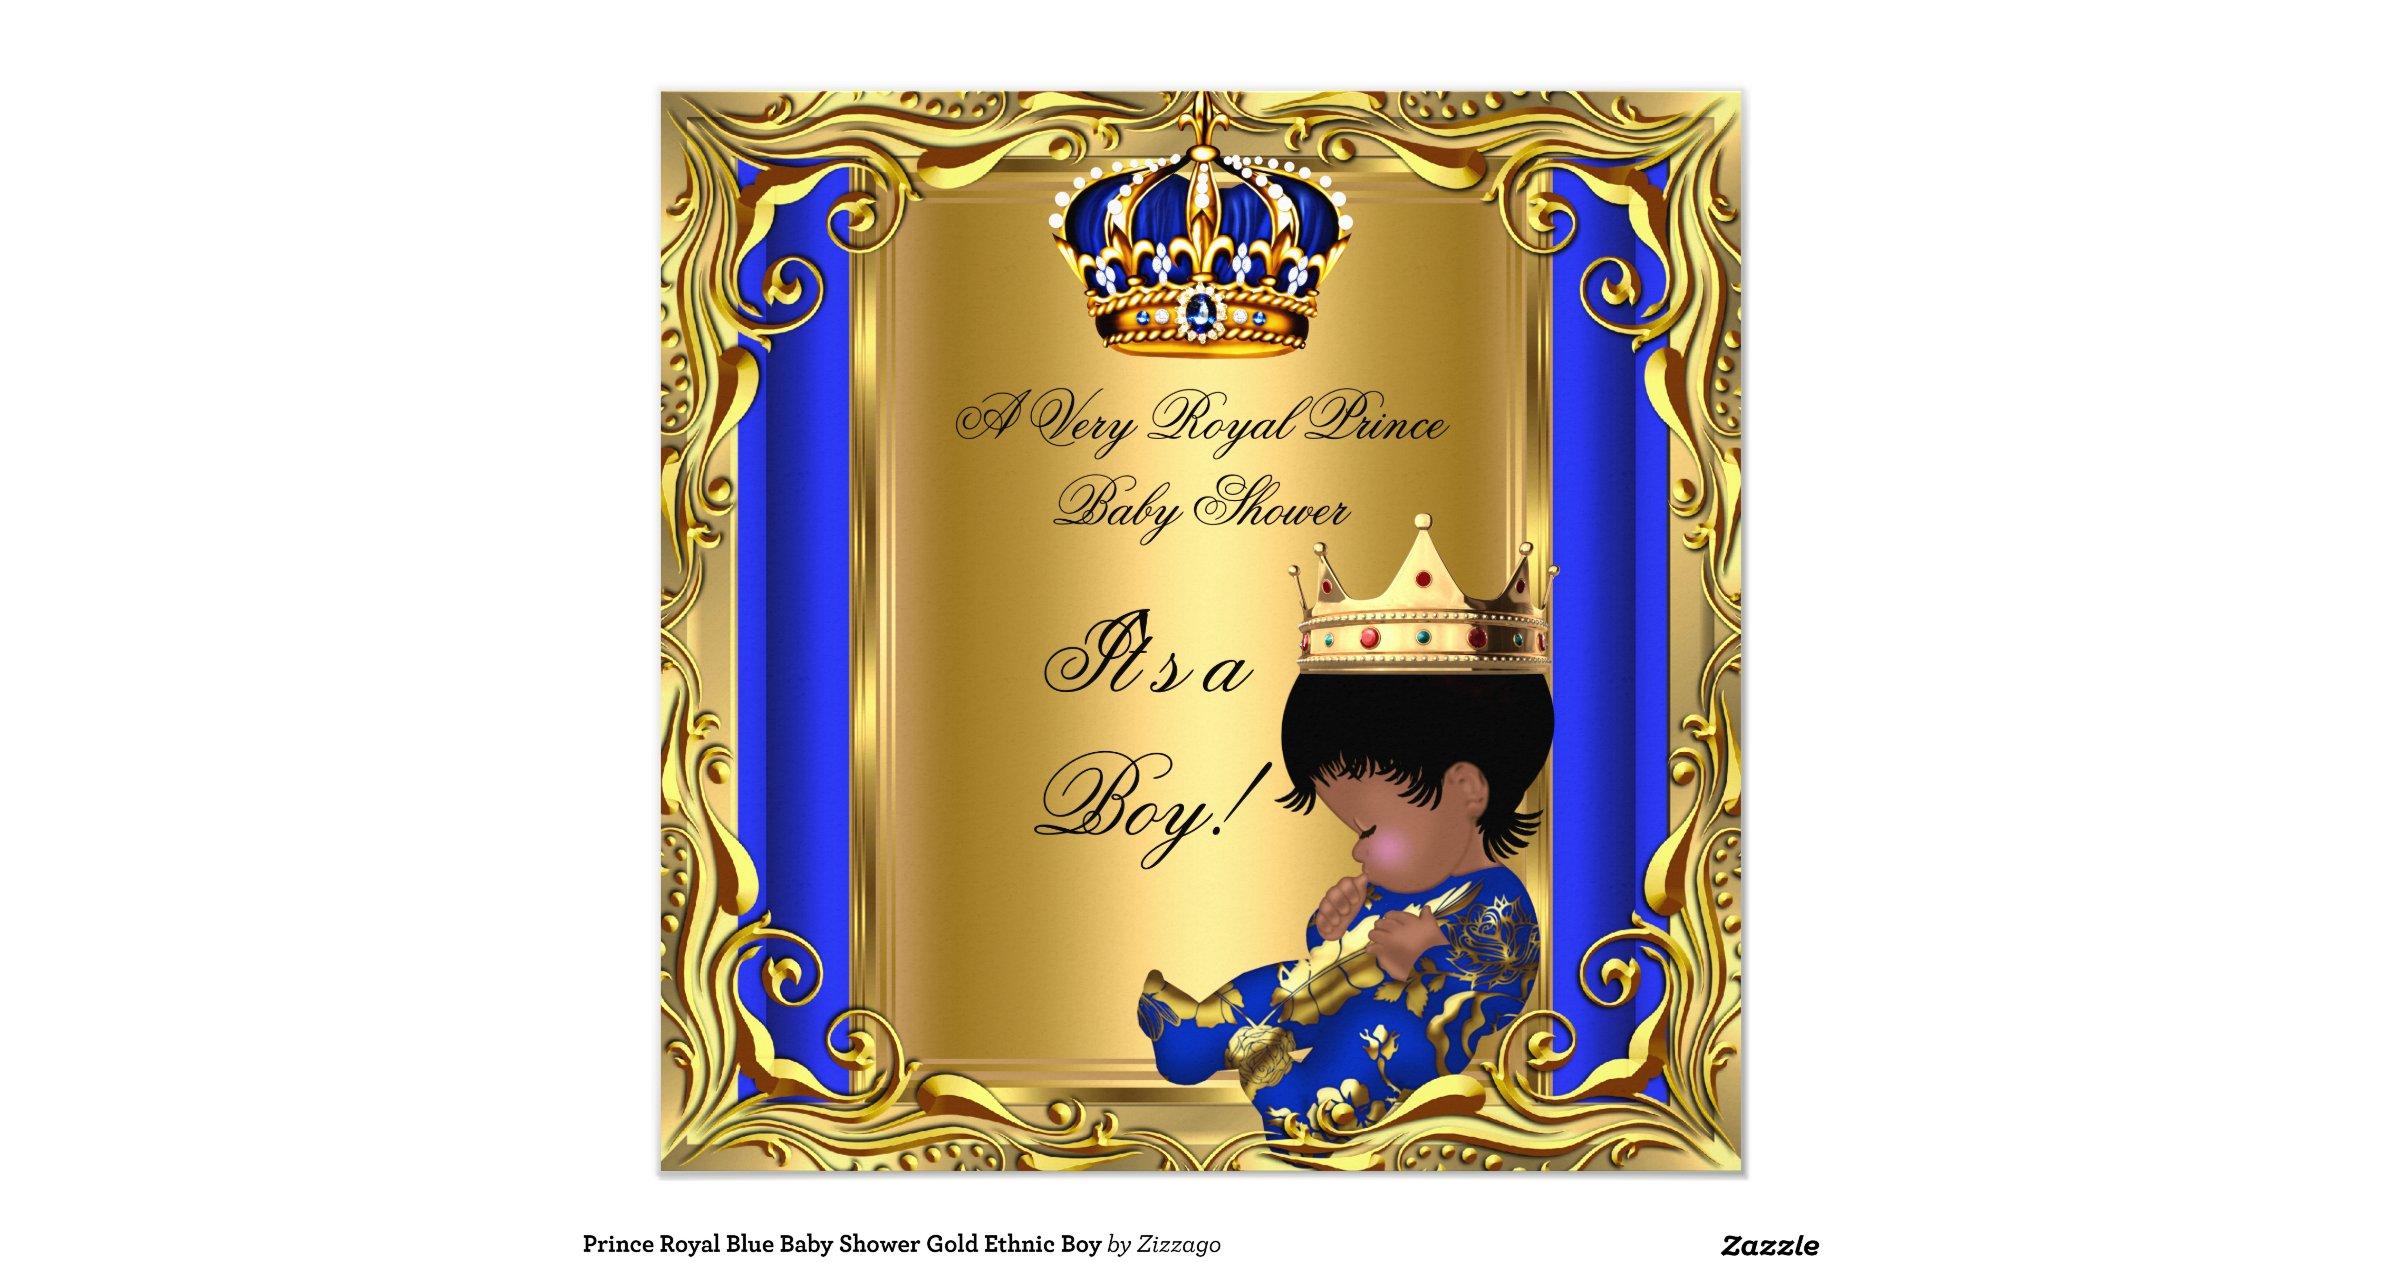 prince royal blue baby shower gold ethnic boy invitation